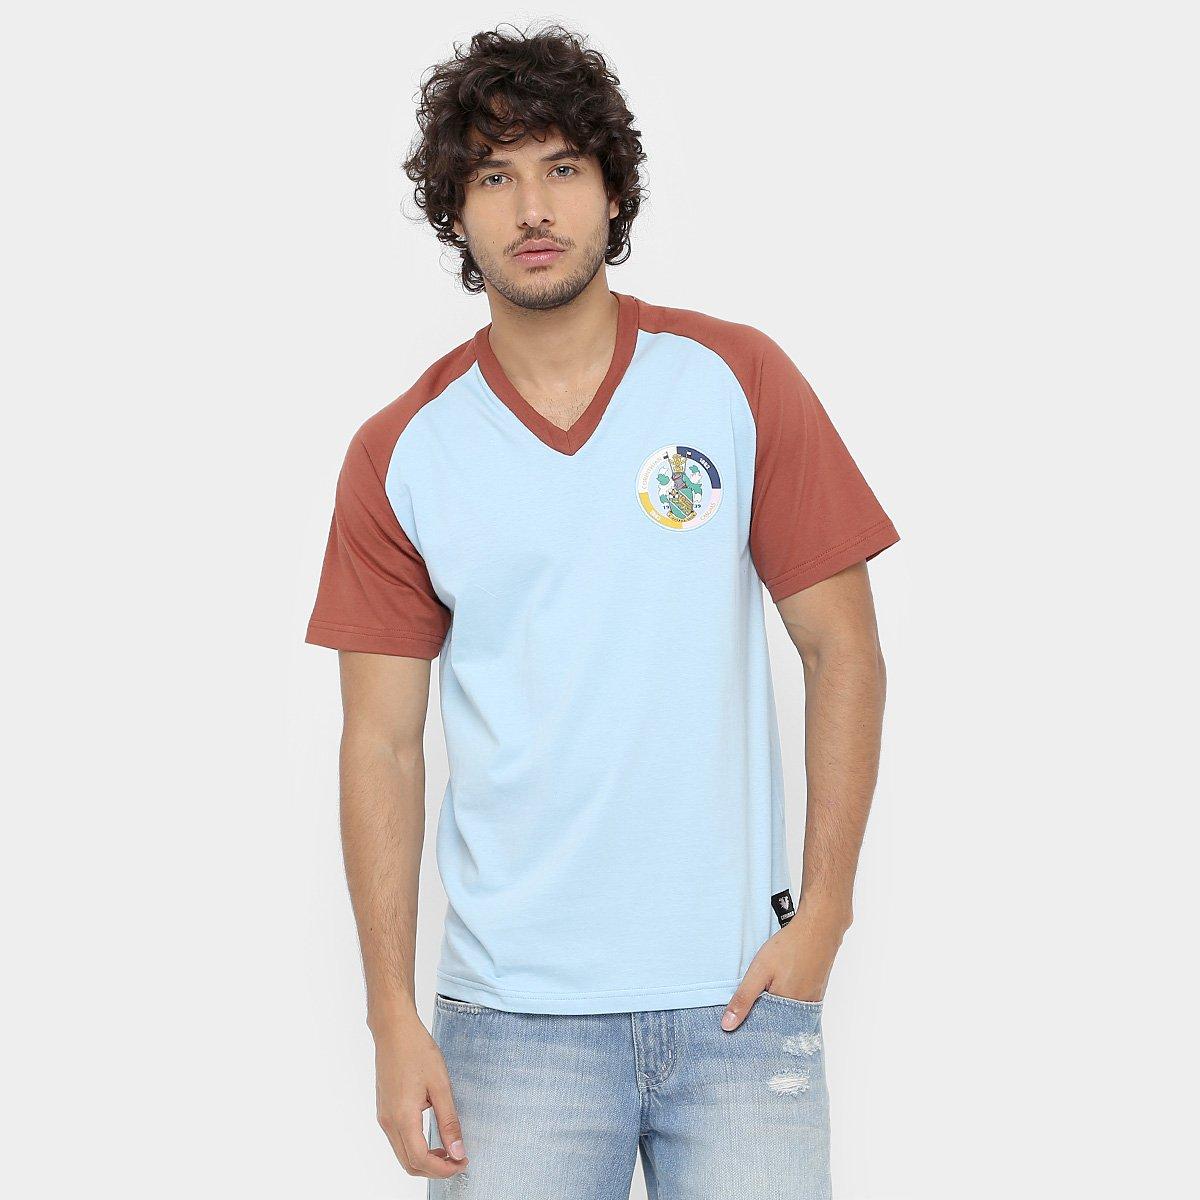 Camisa Retrô Corinthian-Casuals Masculina 76ab5e57e9685